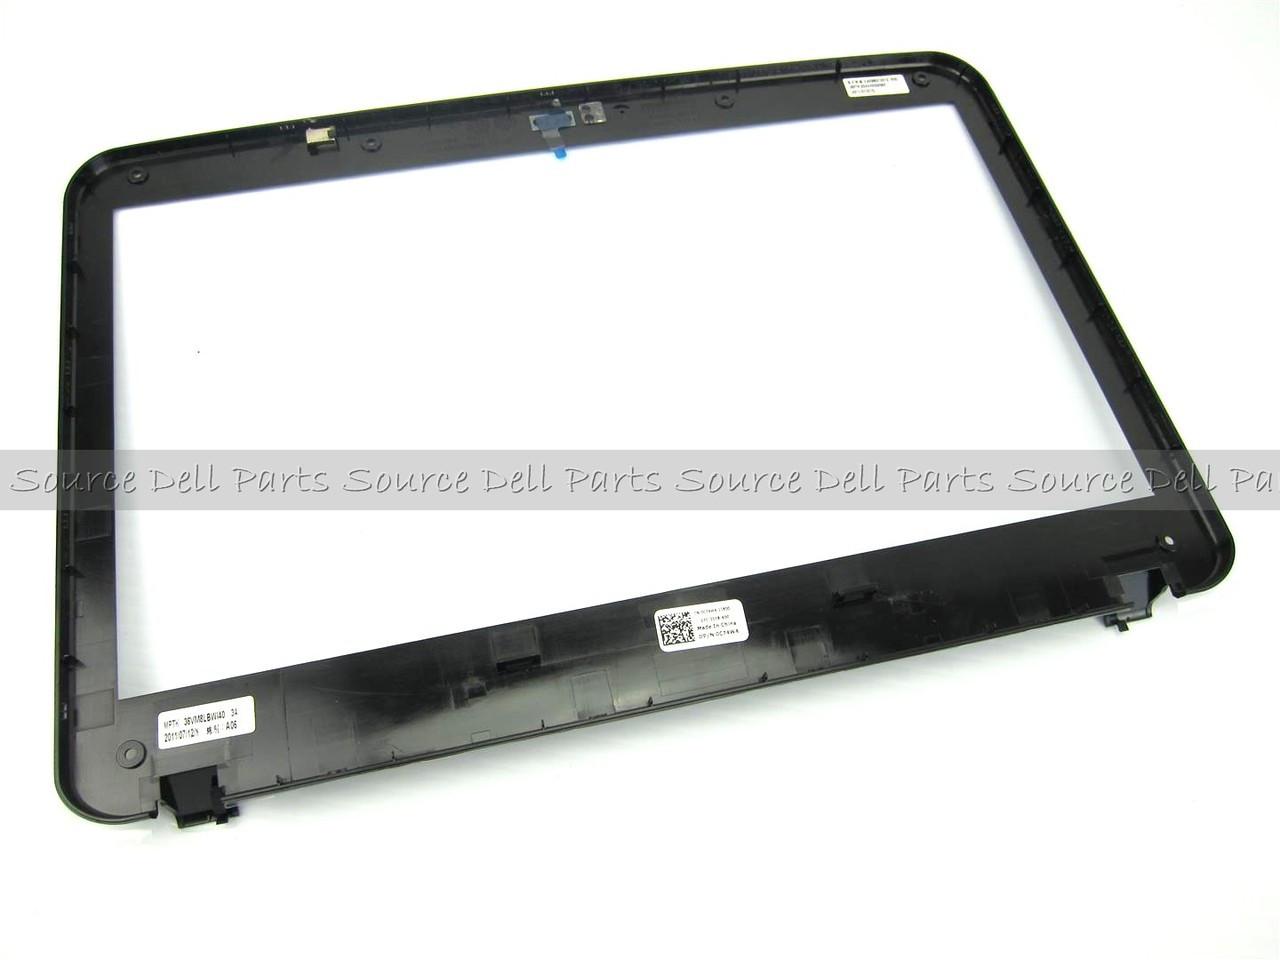 "Dell Vostro 1014 Vostro 1088 14"" LCD Front Trim Bezel W/ Cam Window - C74W4"